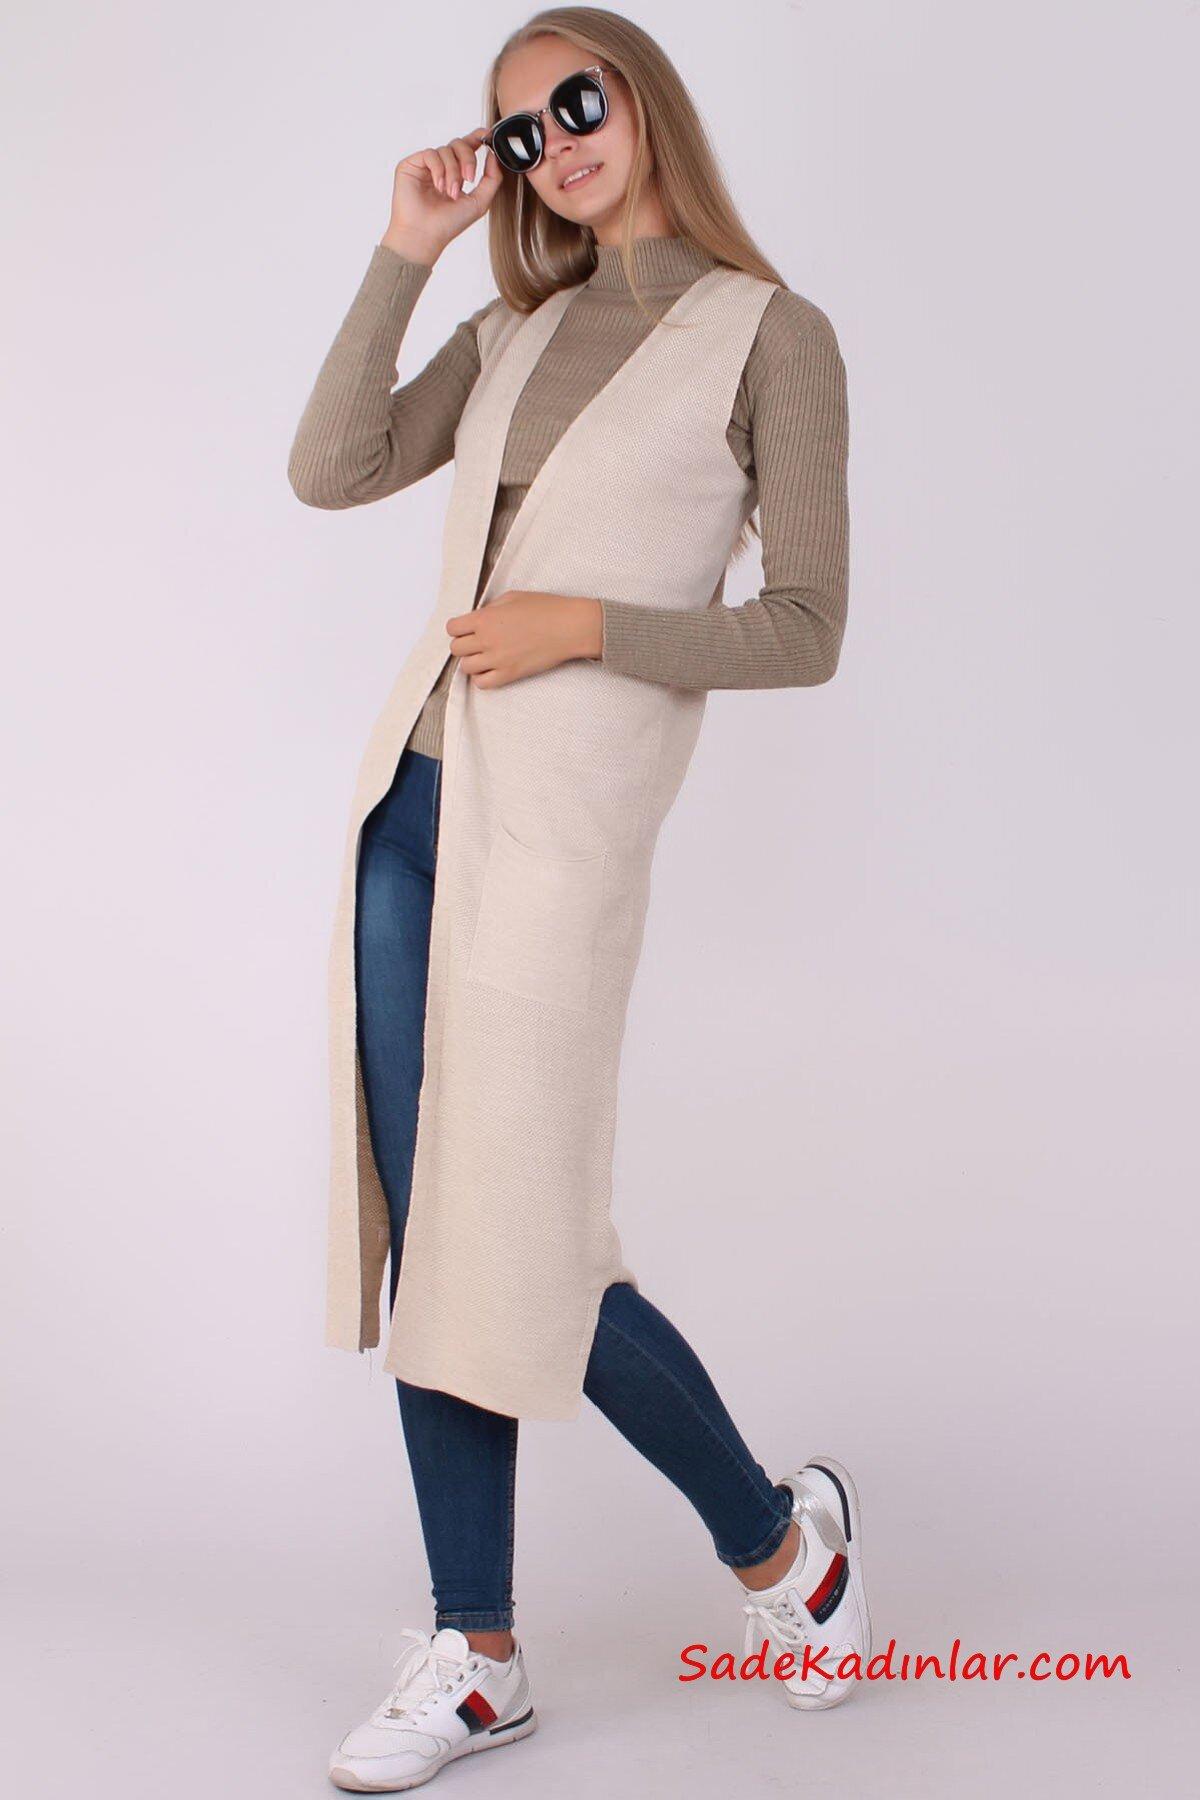 2019 yeni moda kot elbise modelleri